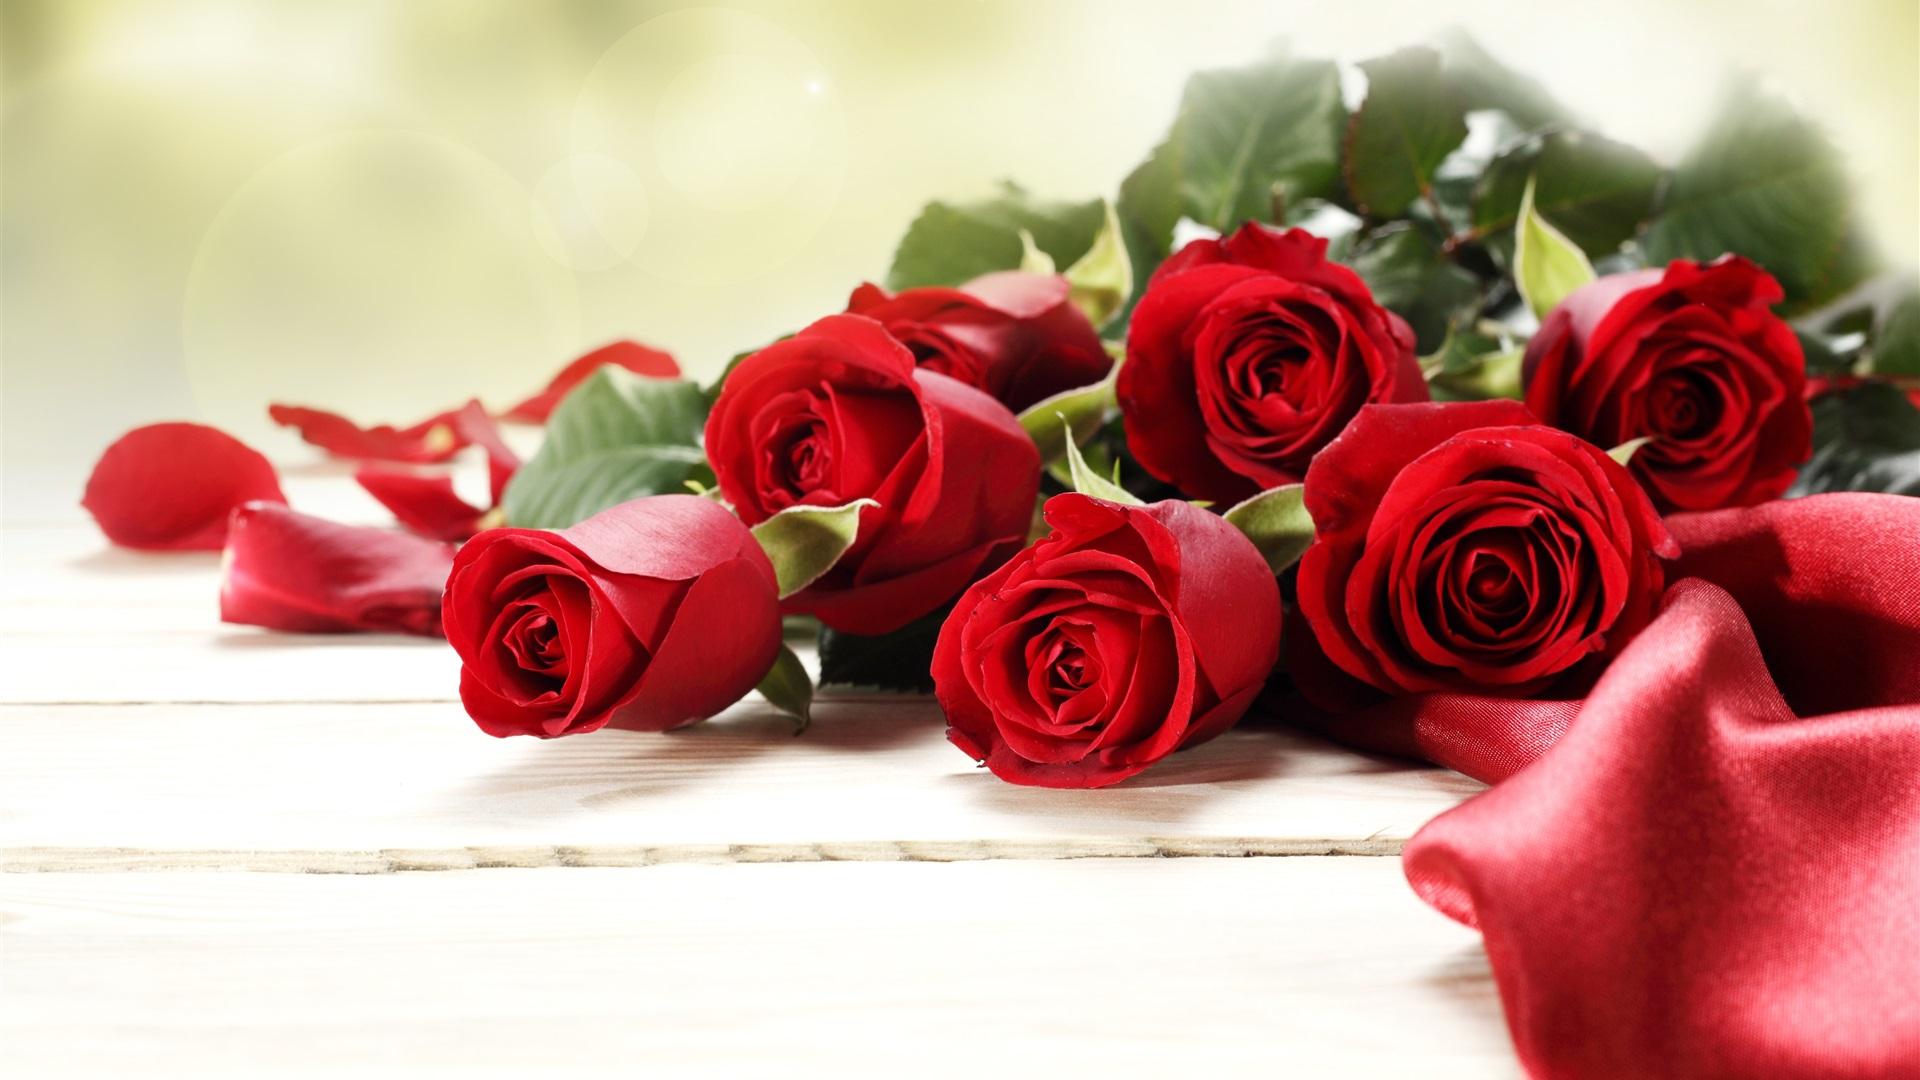 Red Rose Flowers Bouquet Romantic 1080x1920 Iphone 8 7 6 6s Plus